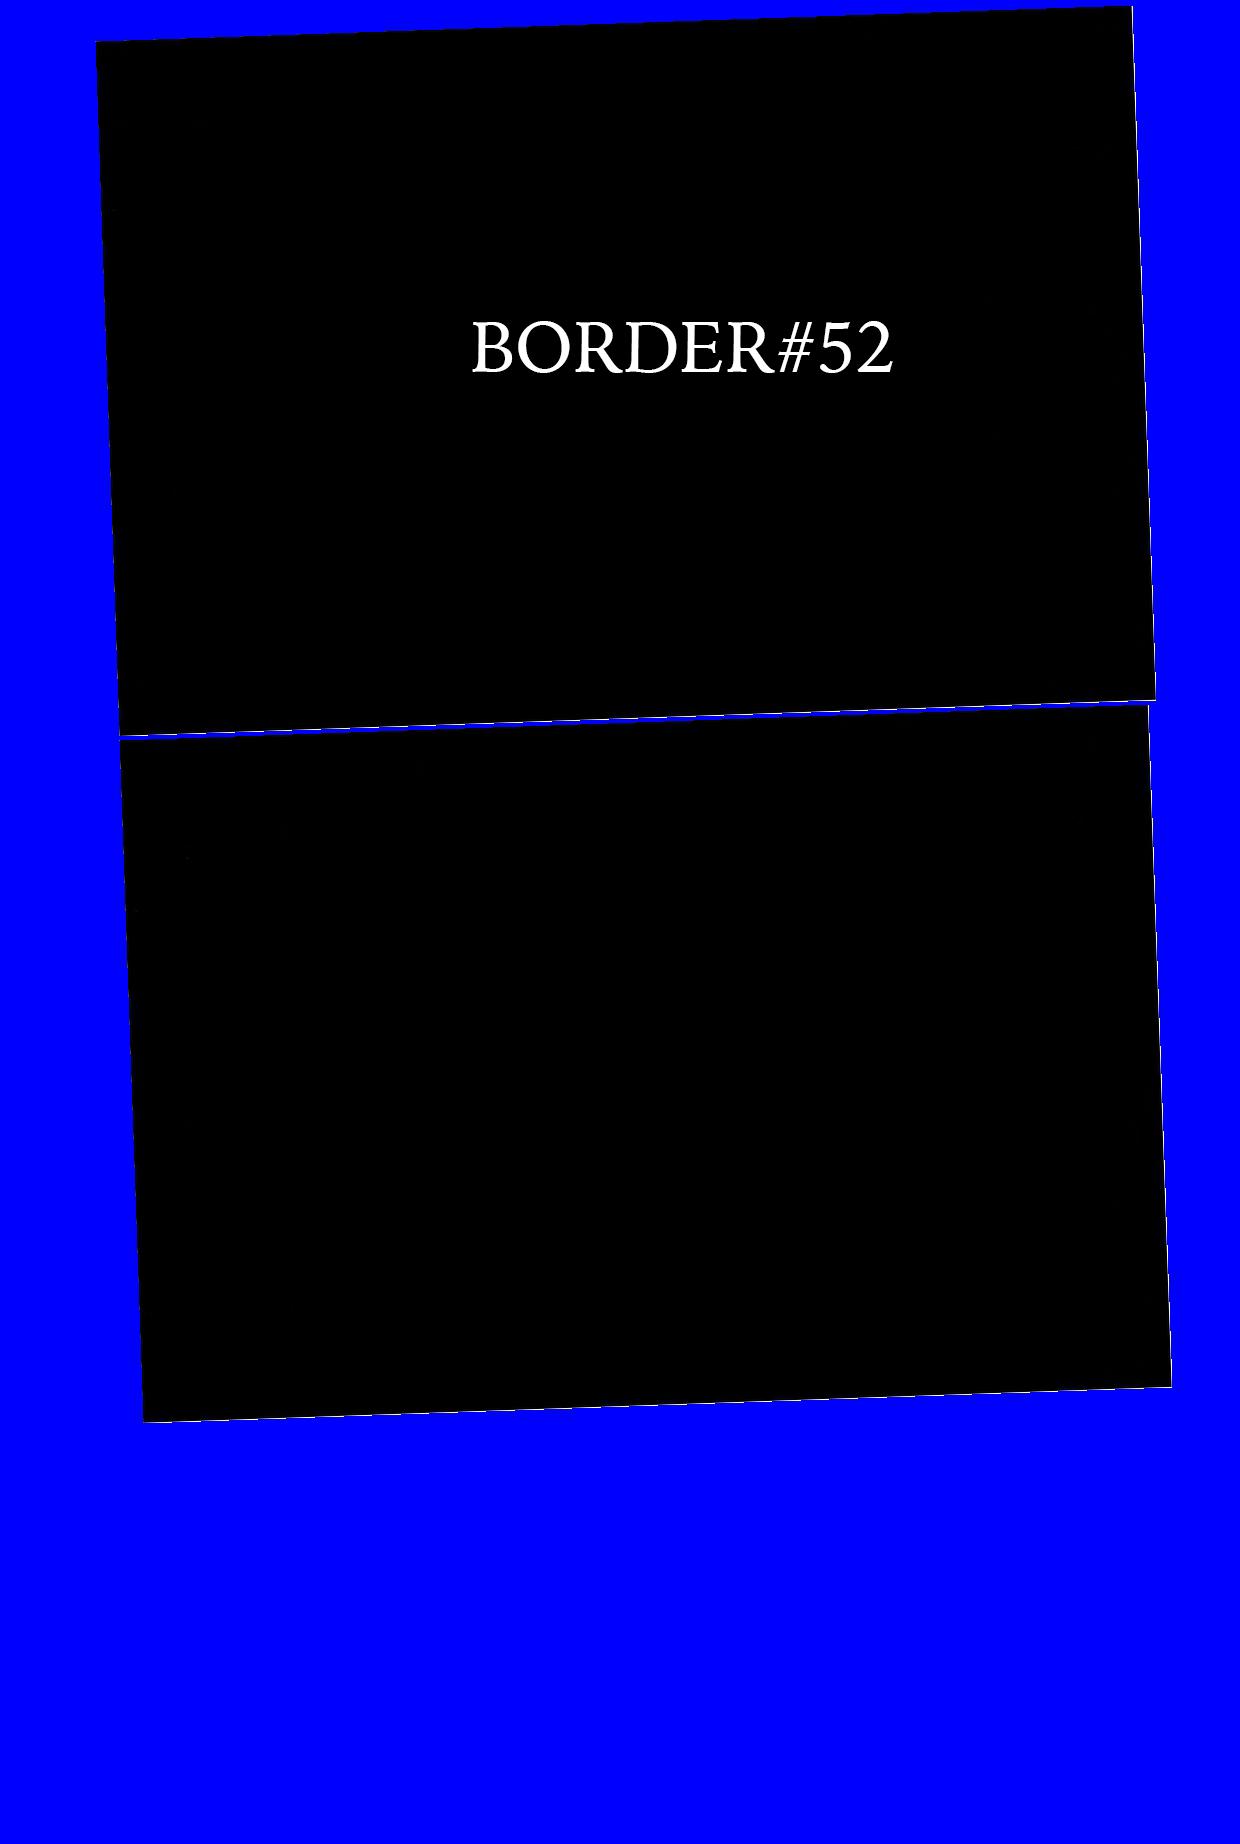 BORDER#52